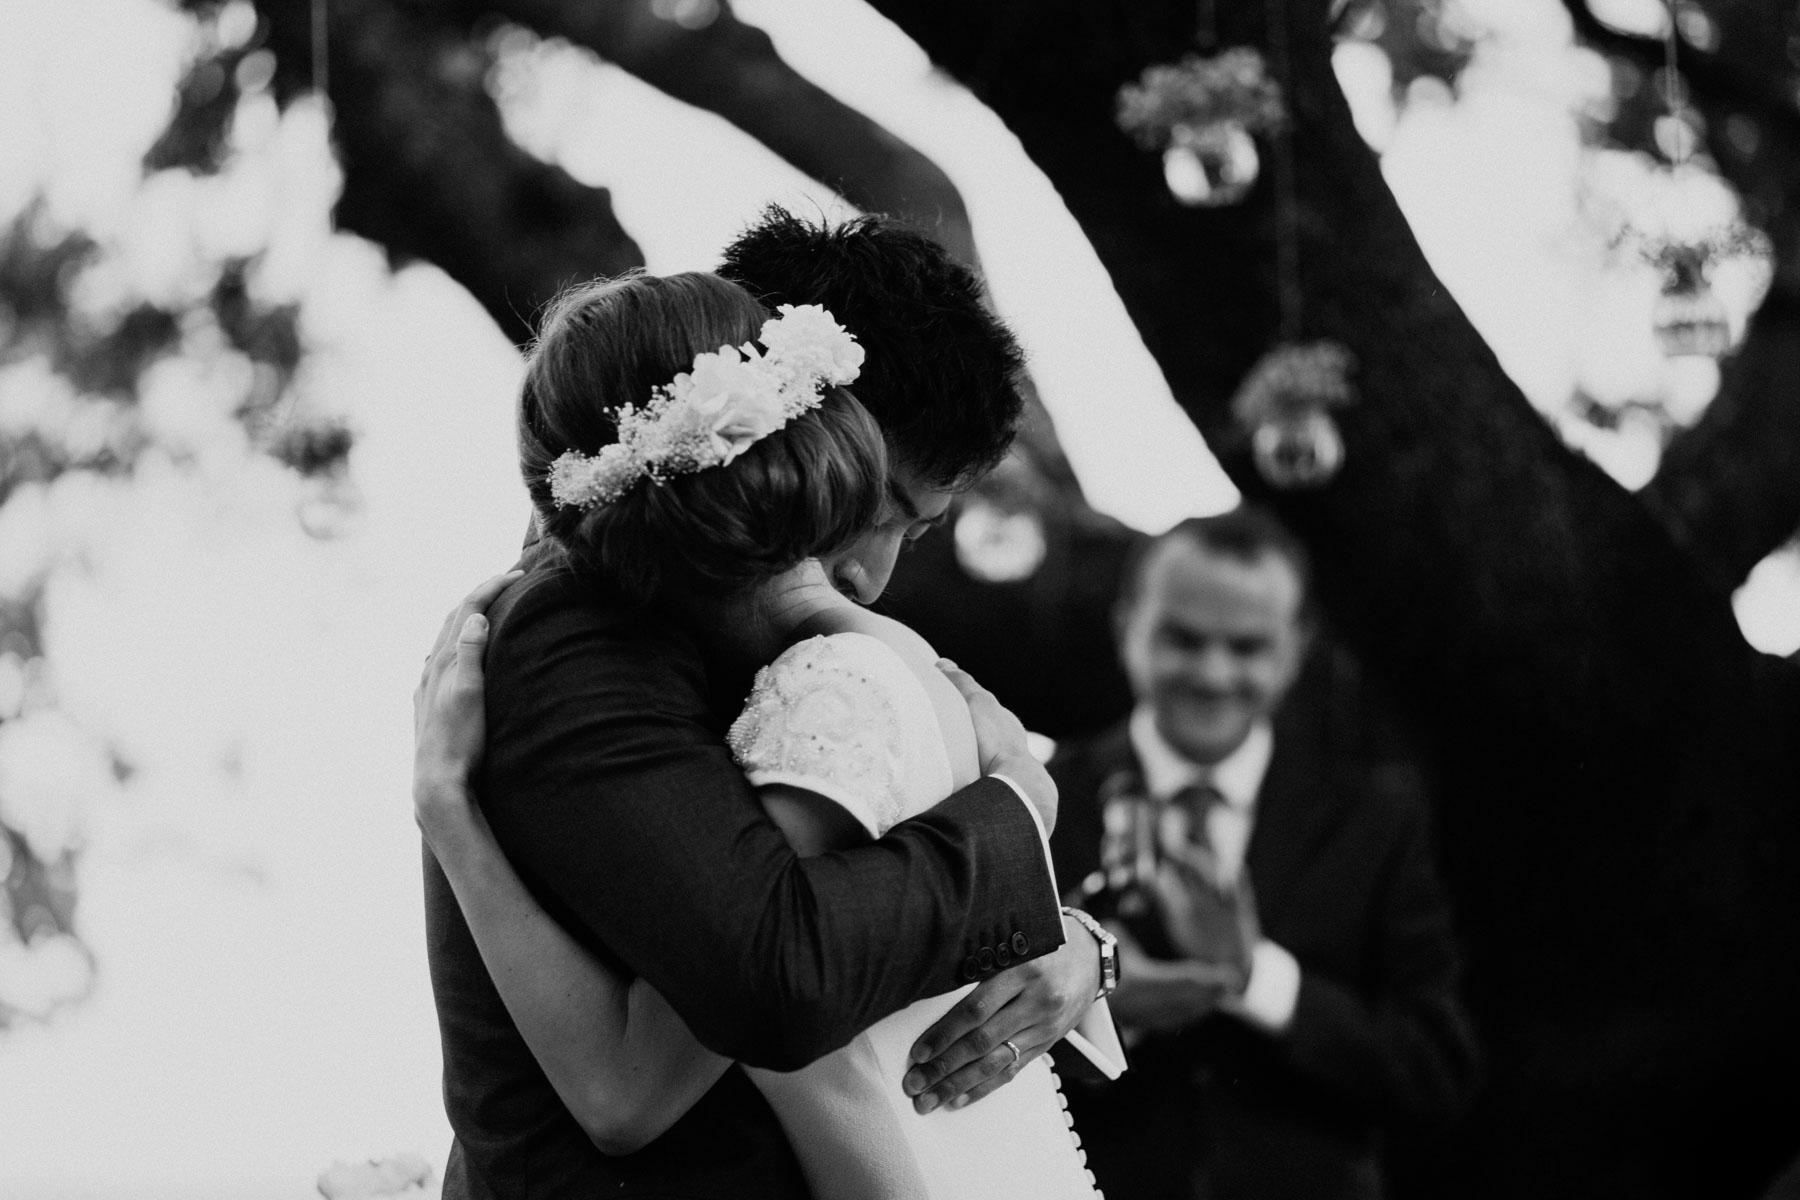 fotografo-de-bodas-toledo-1